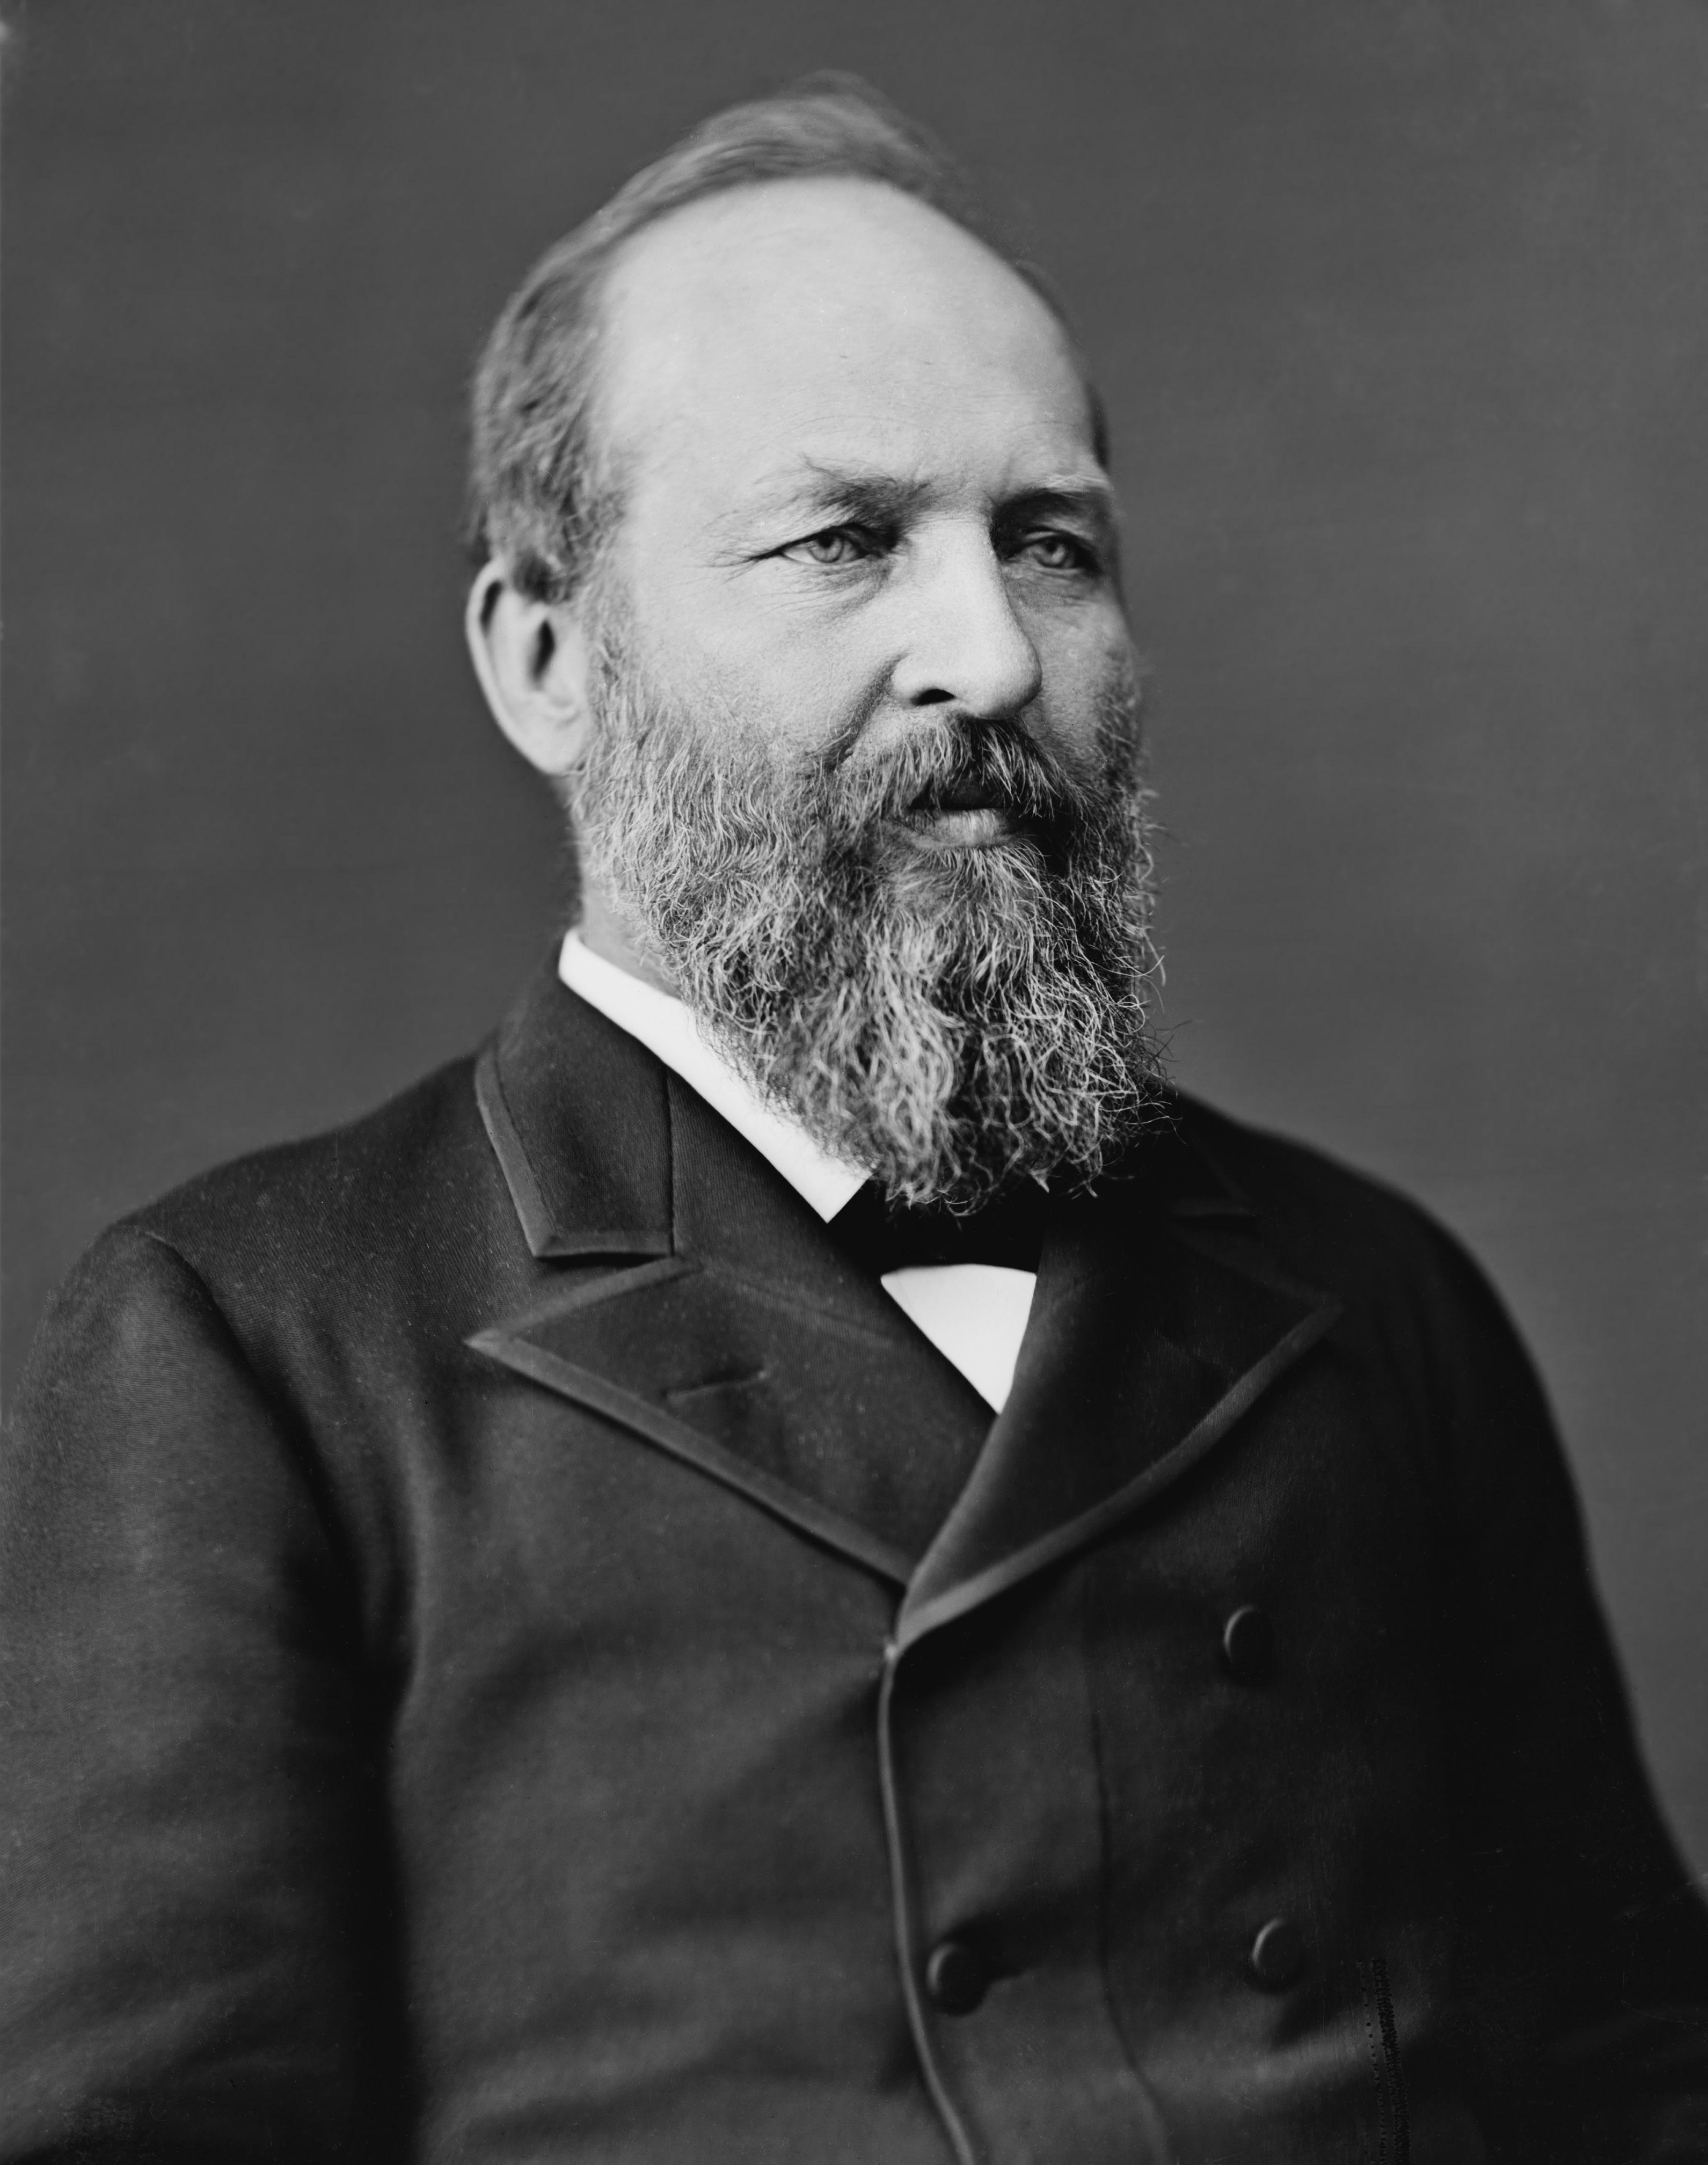 Photograph Of President Garfield